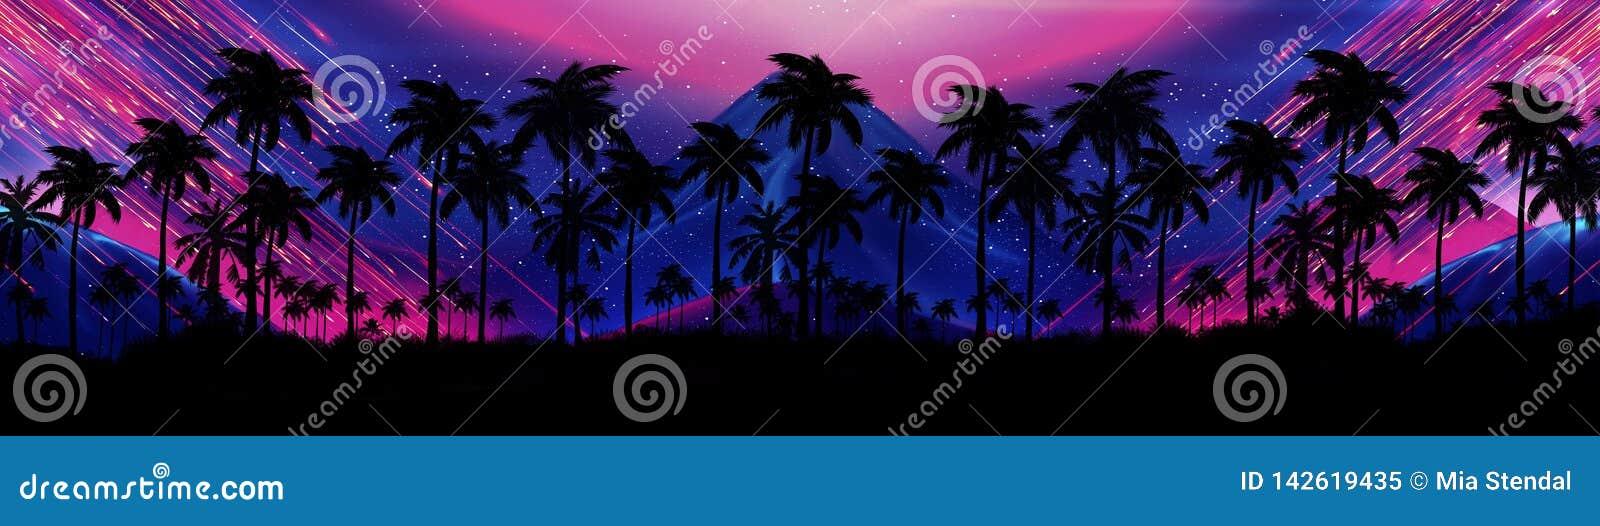 Ландшафт со звездами, заход солнца ночи, звезды Пальмы кокоса силуэта